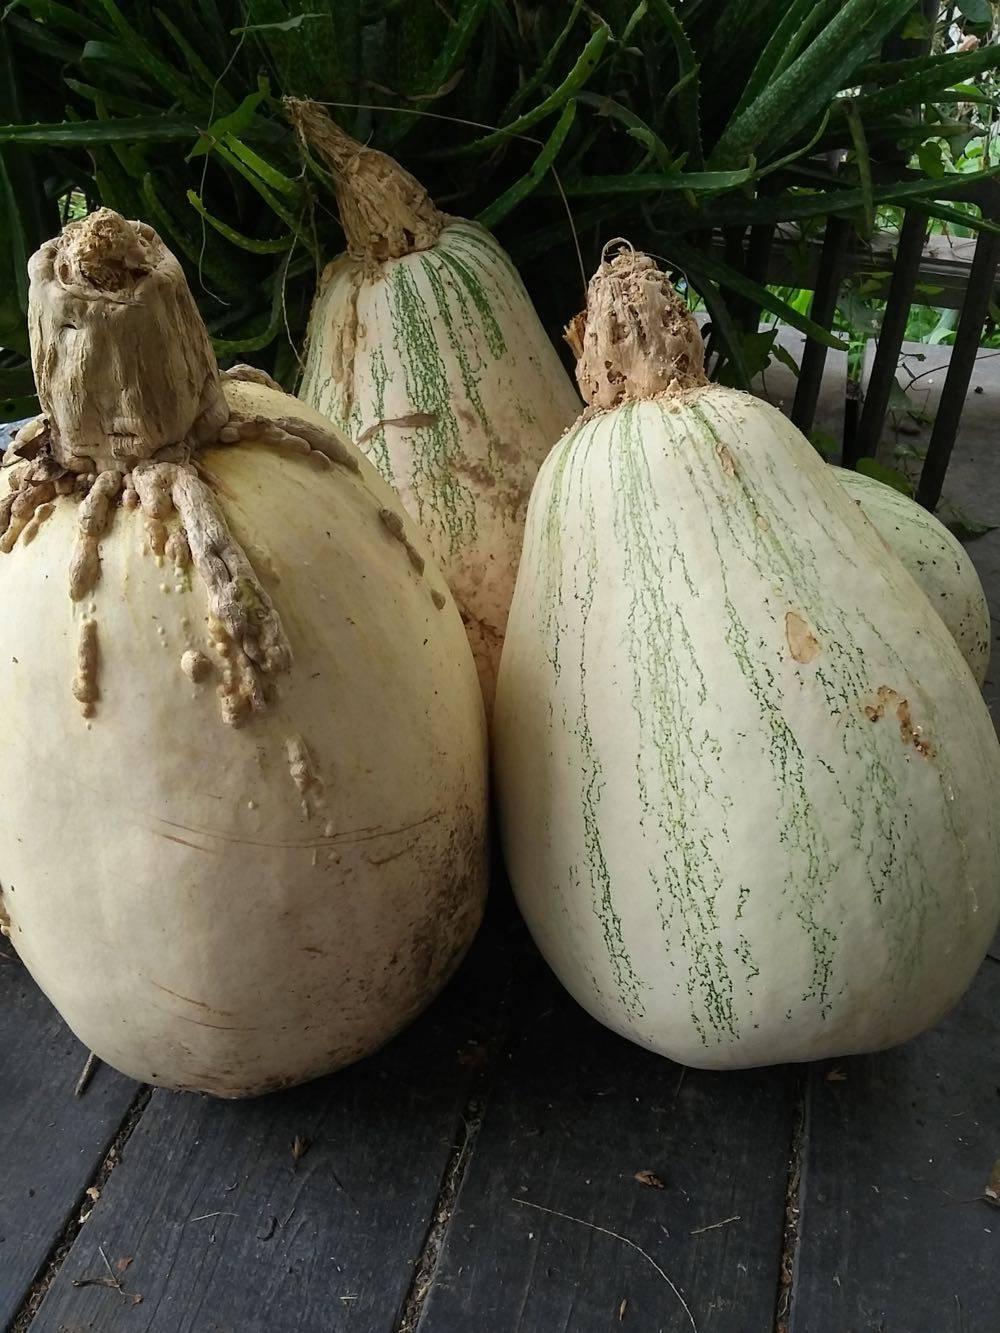 Tennessee Sweet Potato